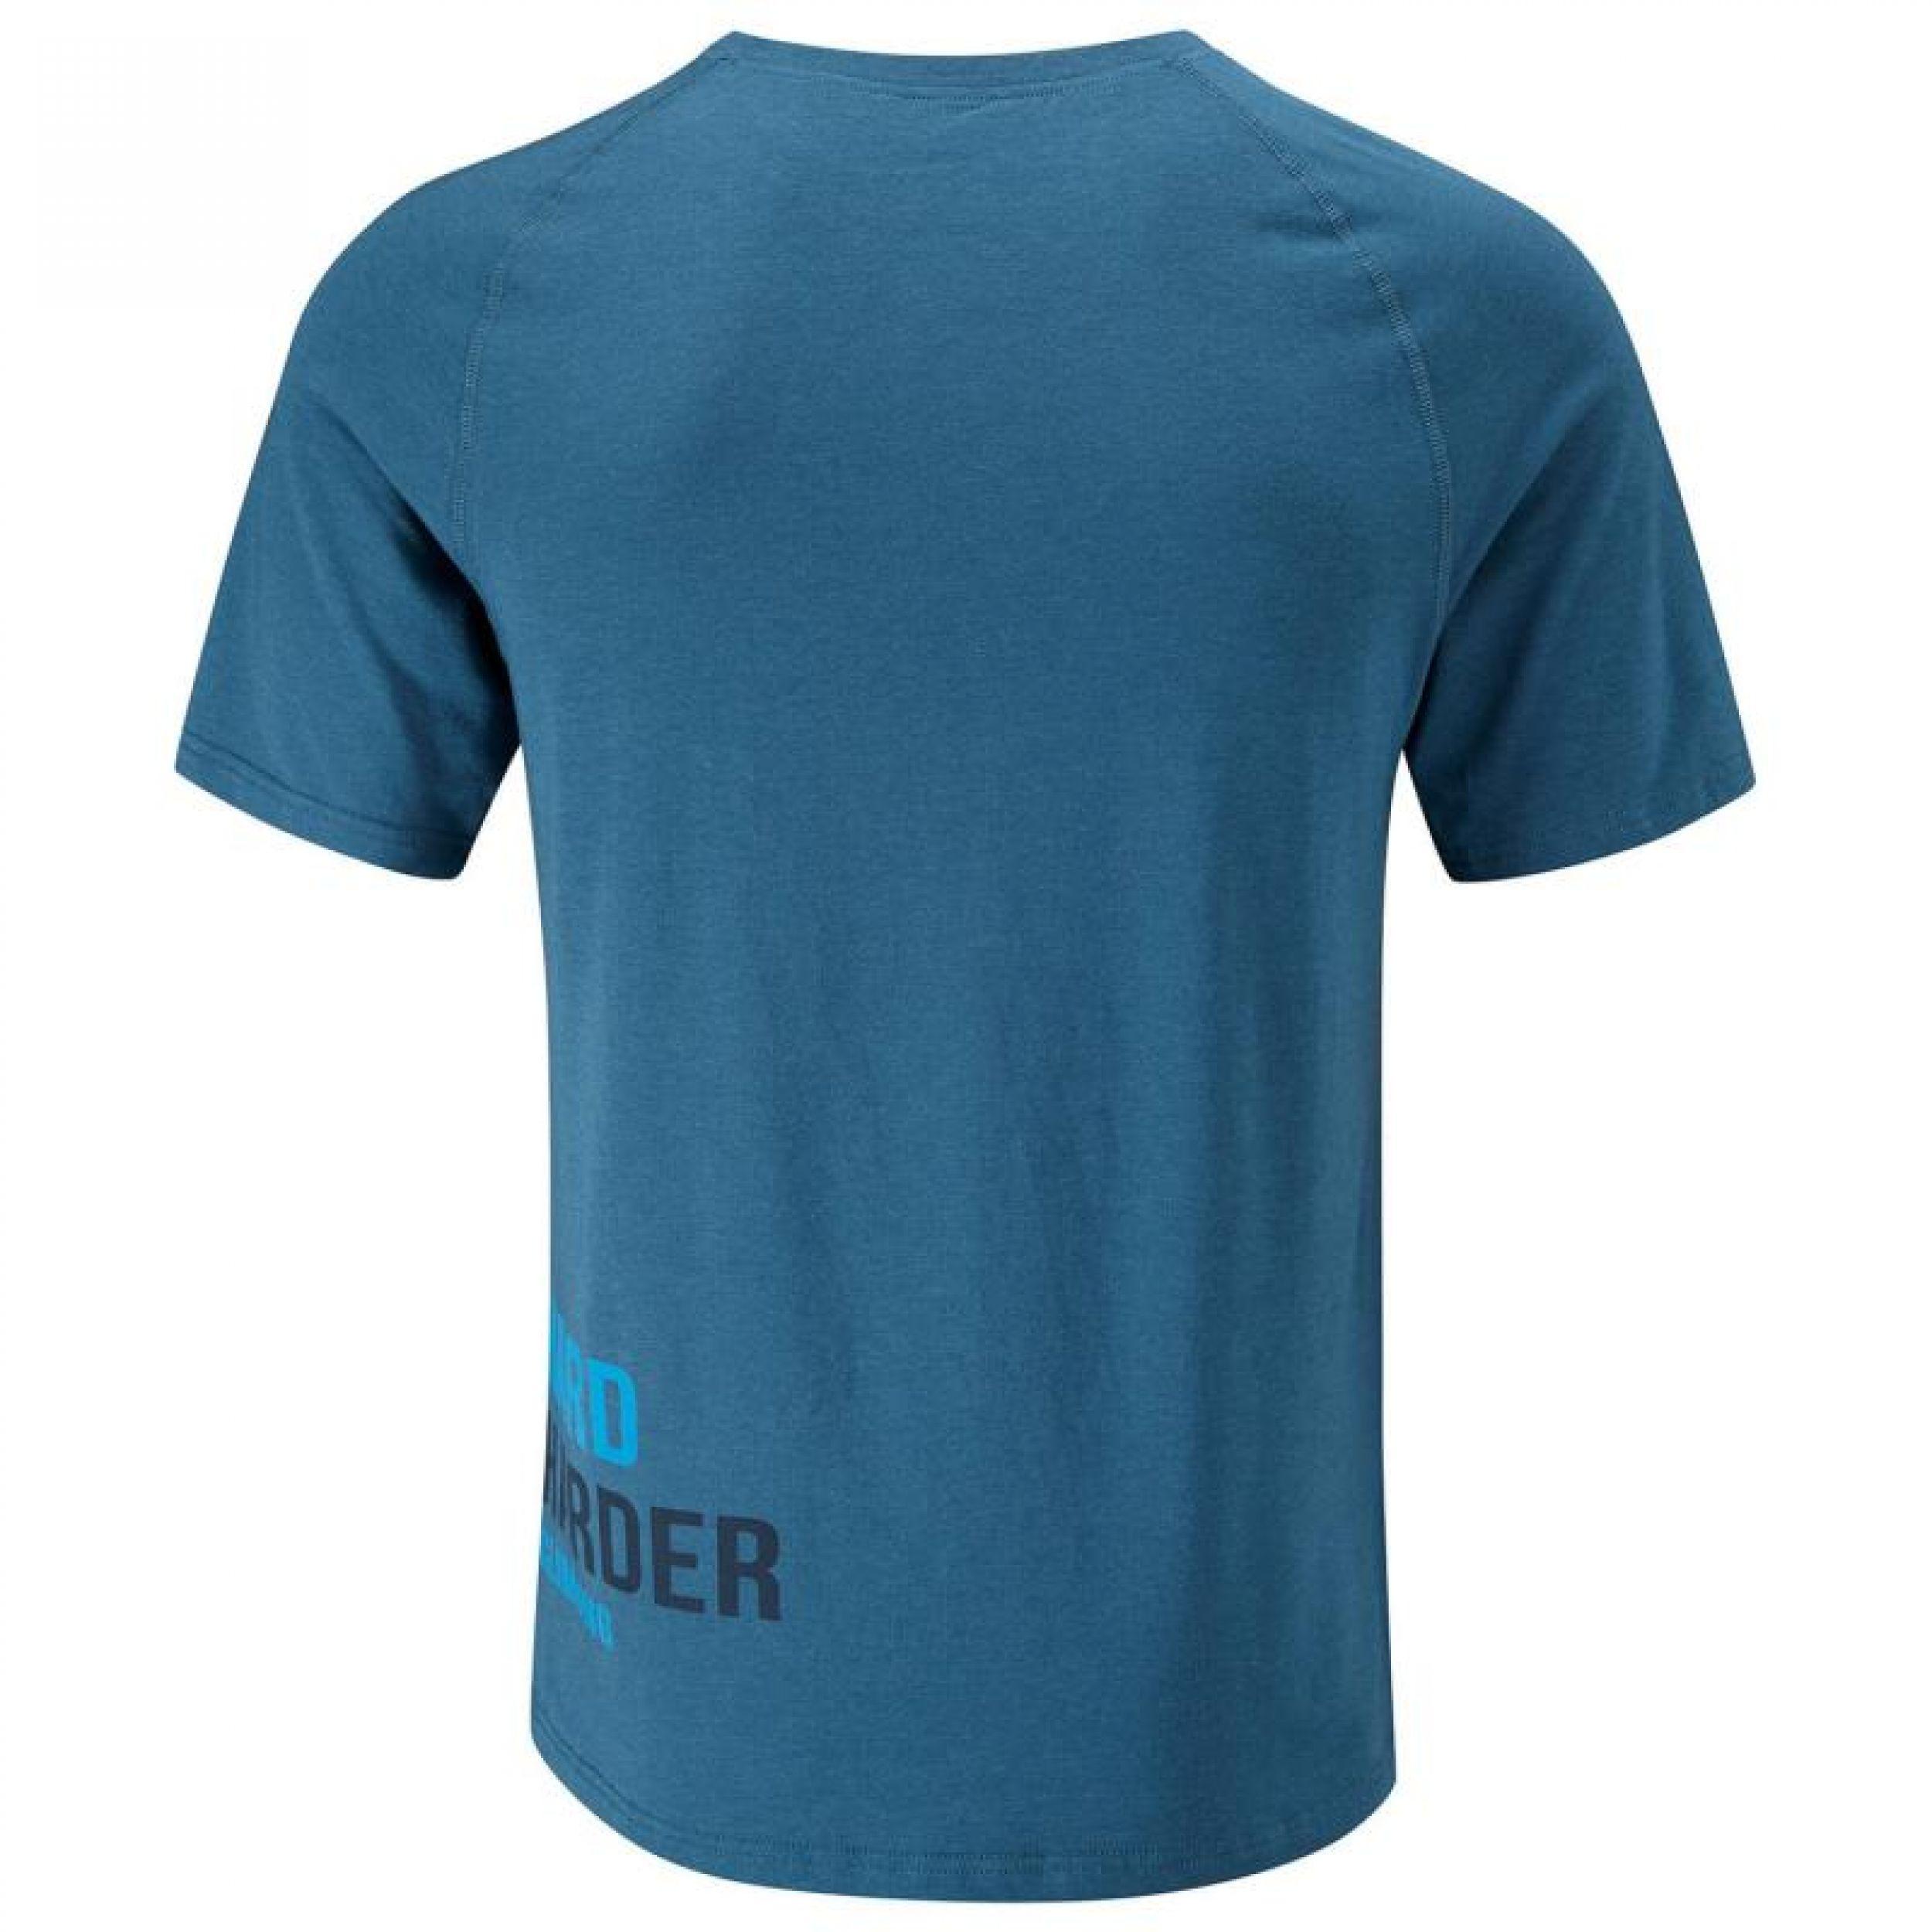 moon-climbing-train-hard-tech-tee-t-shirt-detail-2.jpg